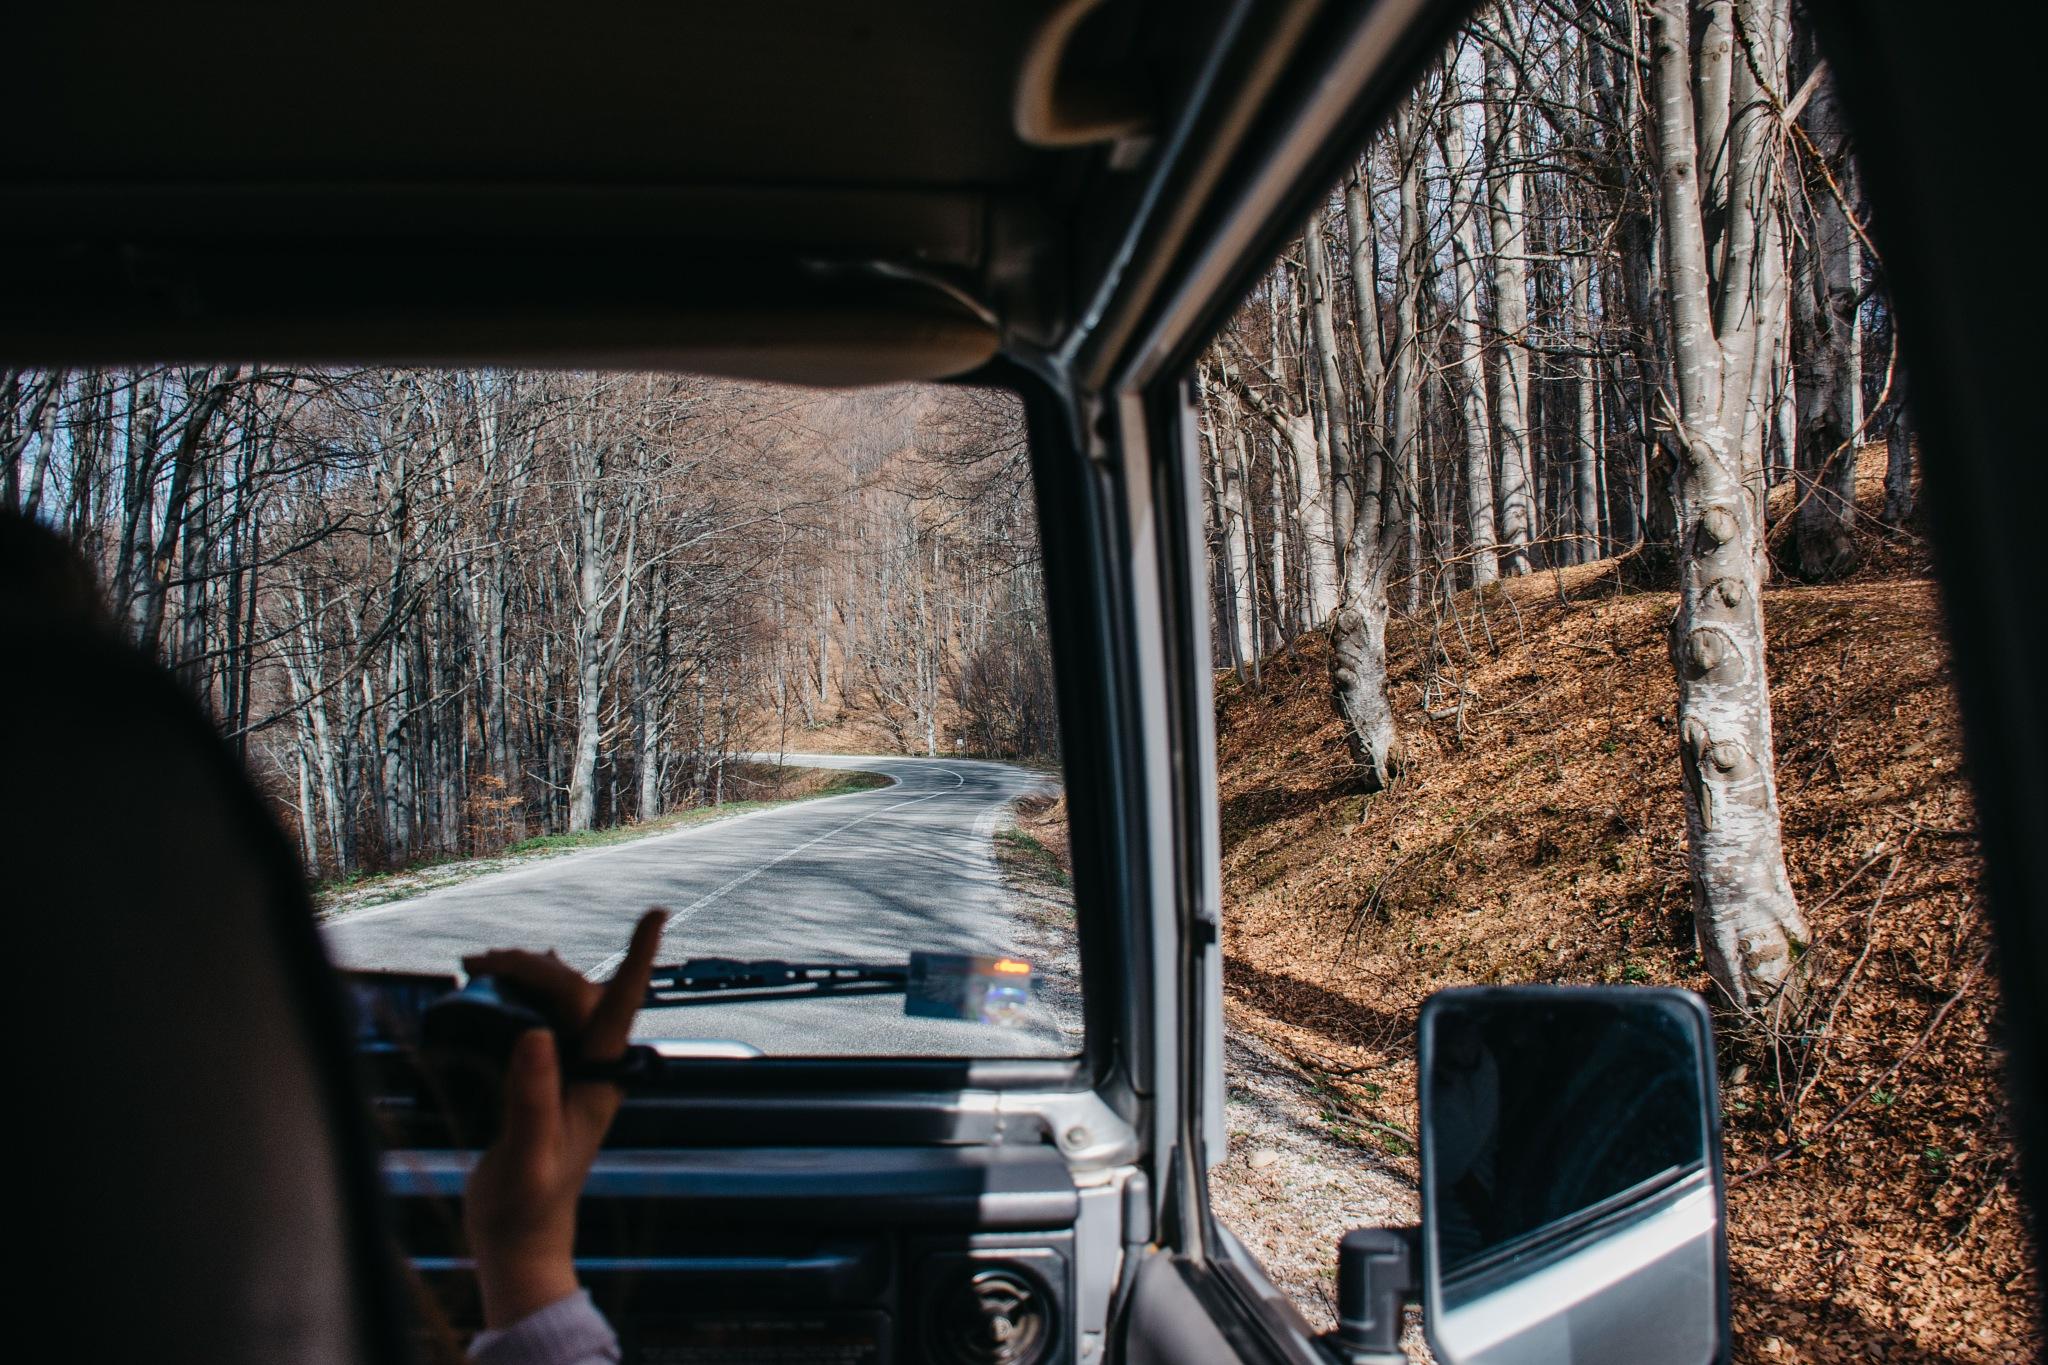 Driving in nature by Vuk Šarić